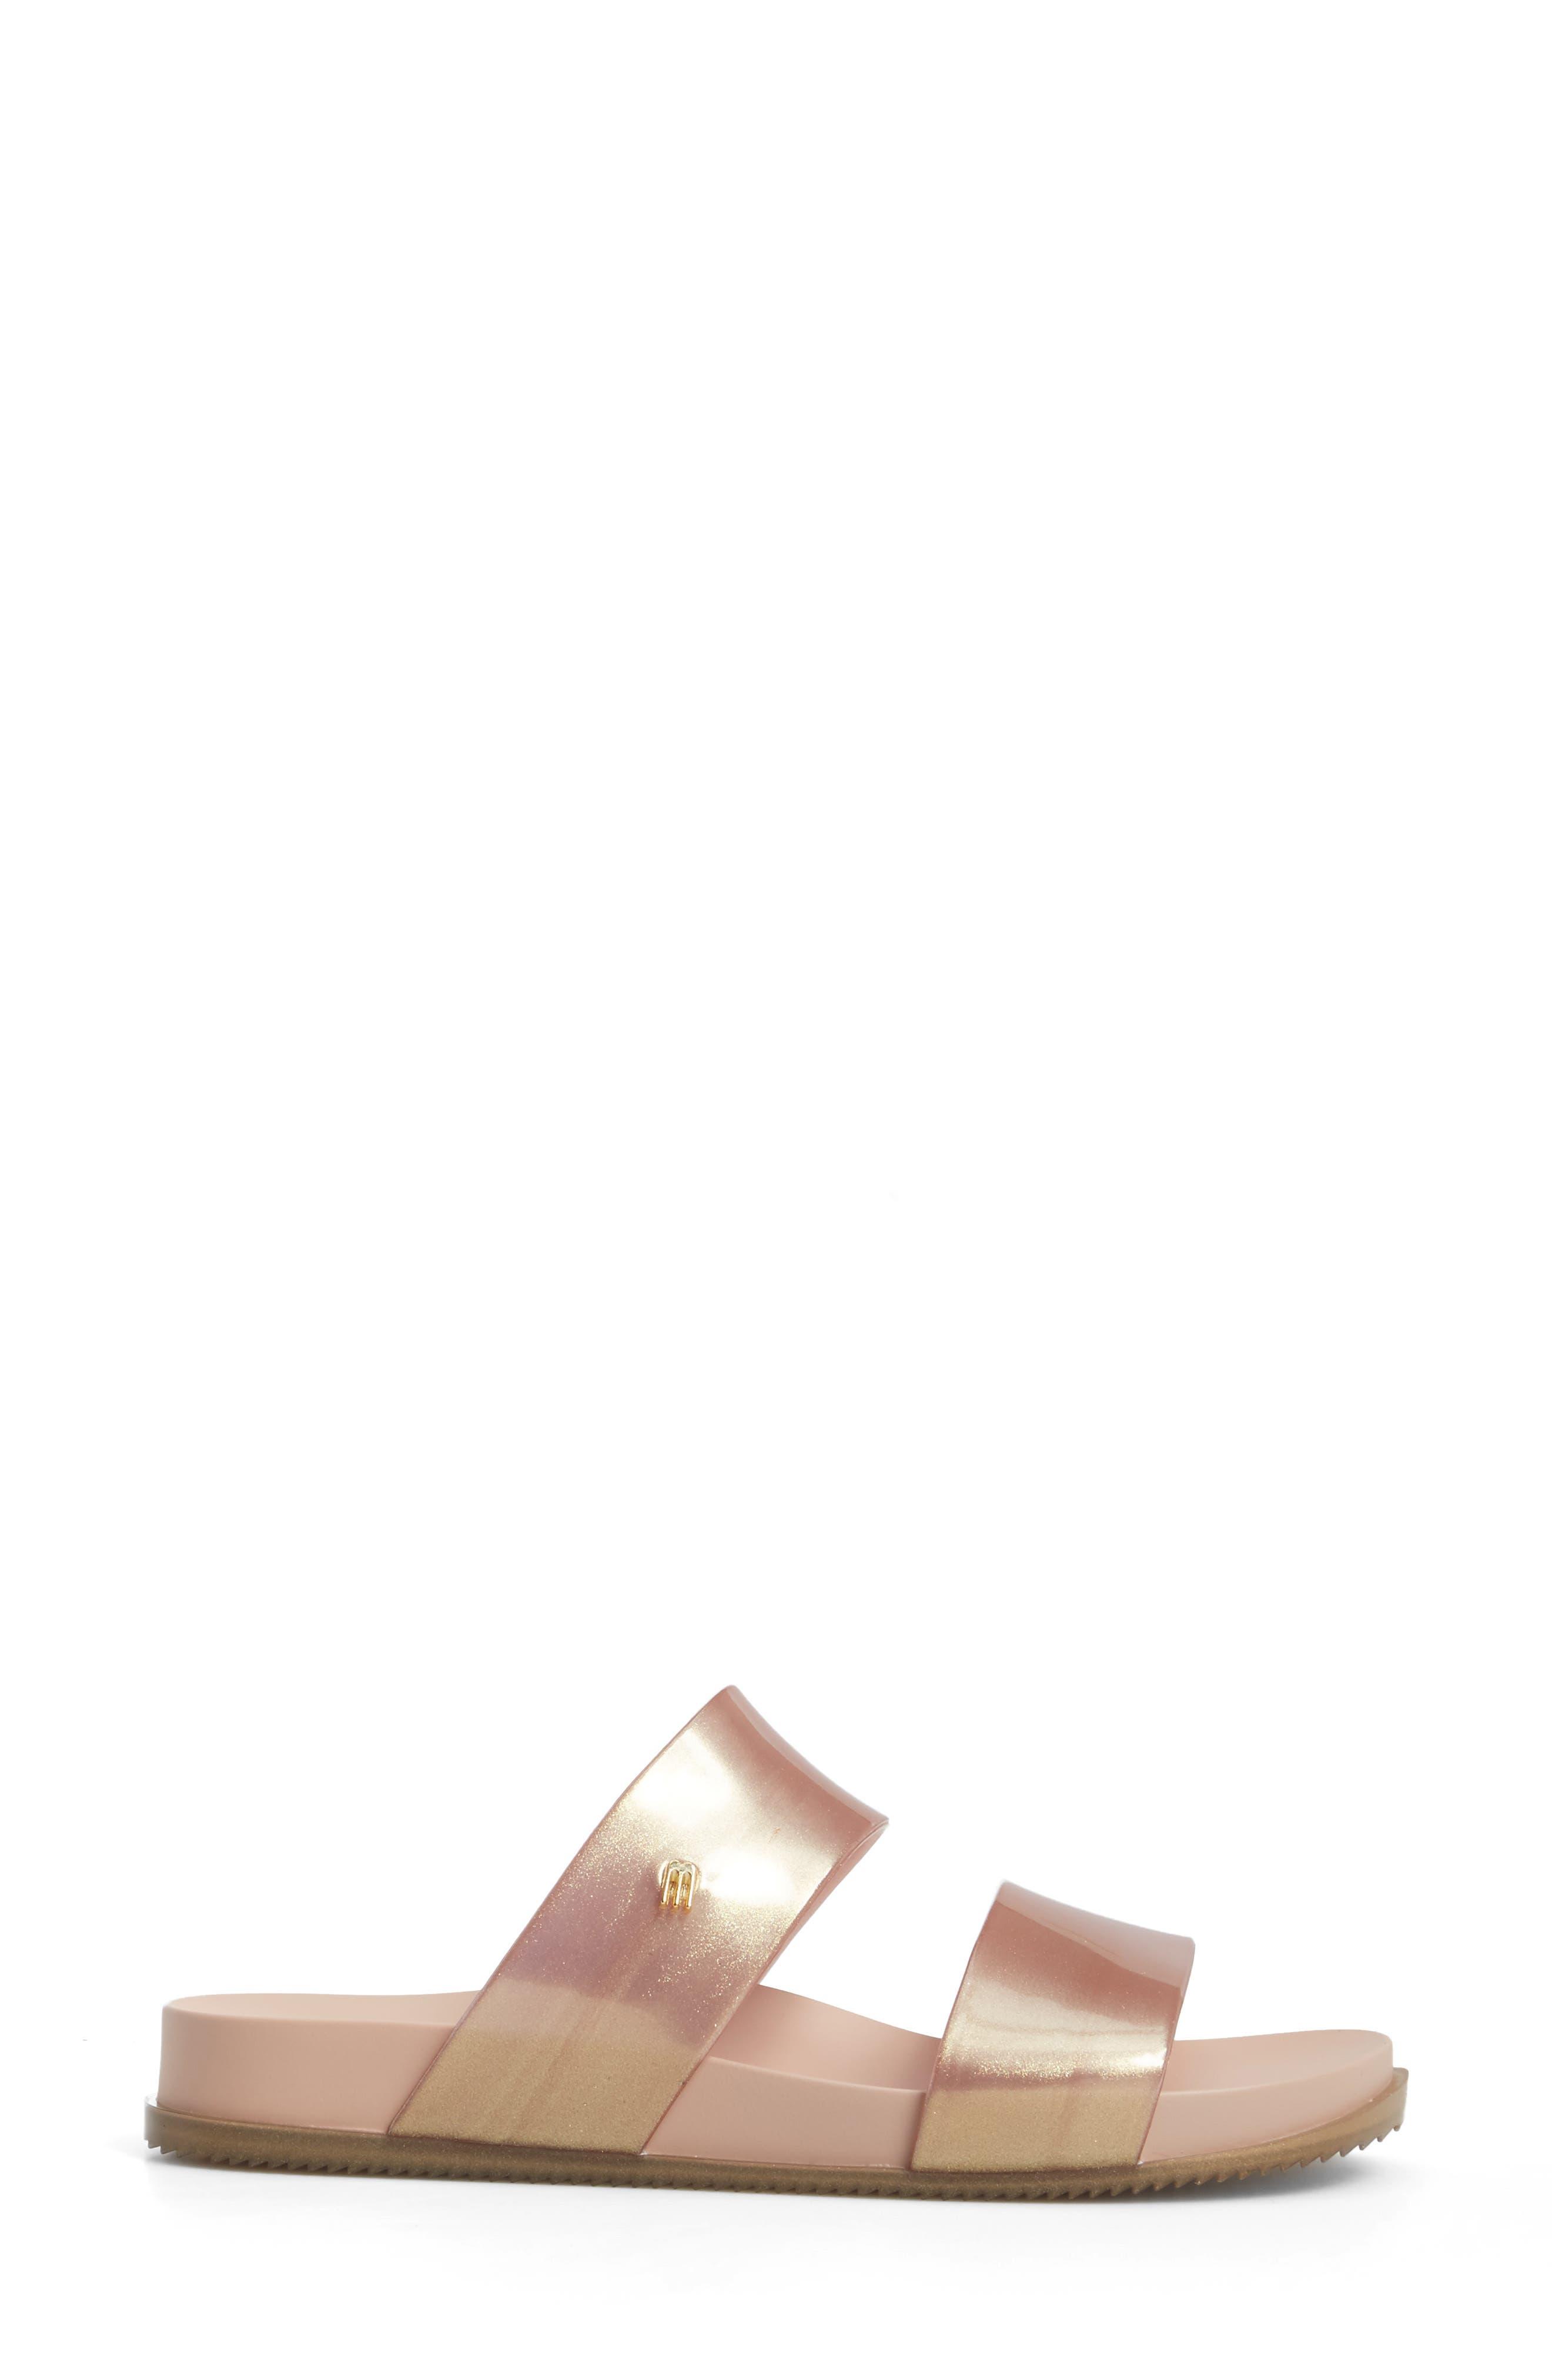 'Cosmic' Sandal,                             Alternate thumbnail 3, color,                             Metallic Pink